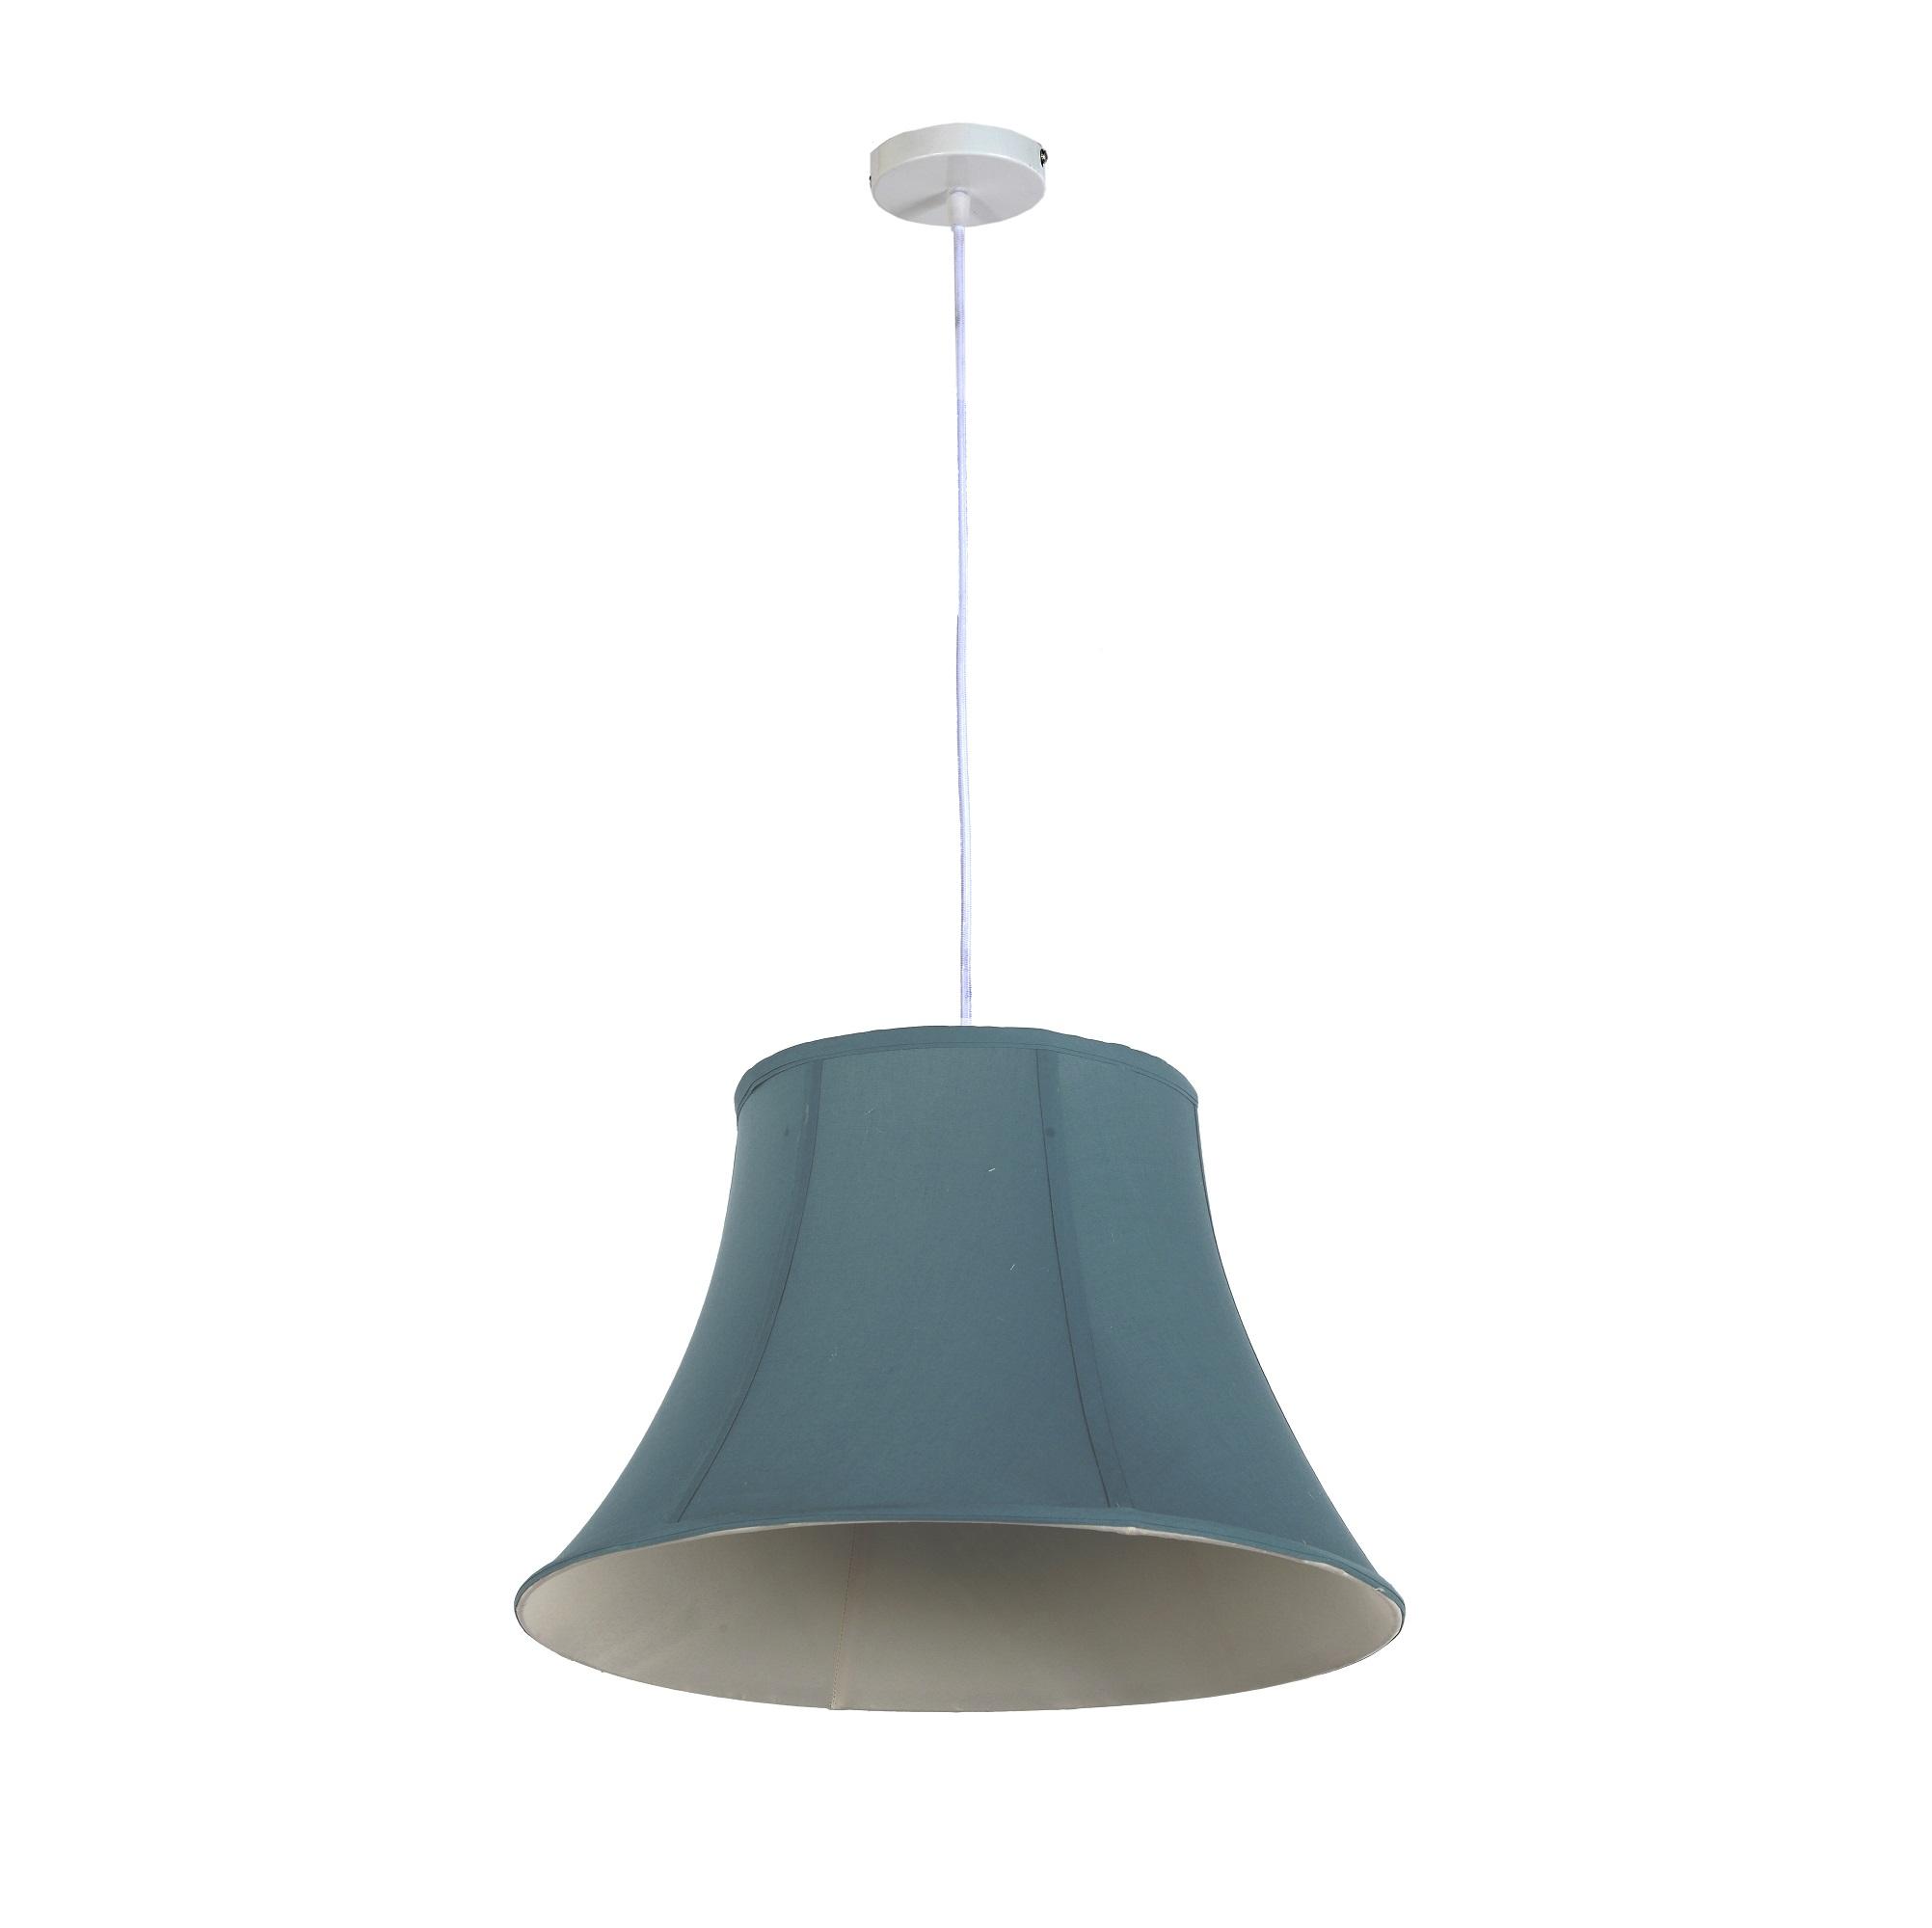 Фото - Подвесной светильник Arti Lampadari Cantare E 1.3.P1 GR подвесной светильник arti lampadari olio e 1 3 p1 br